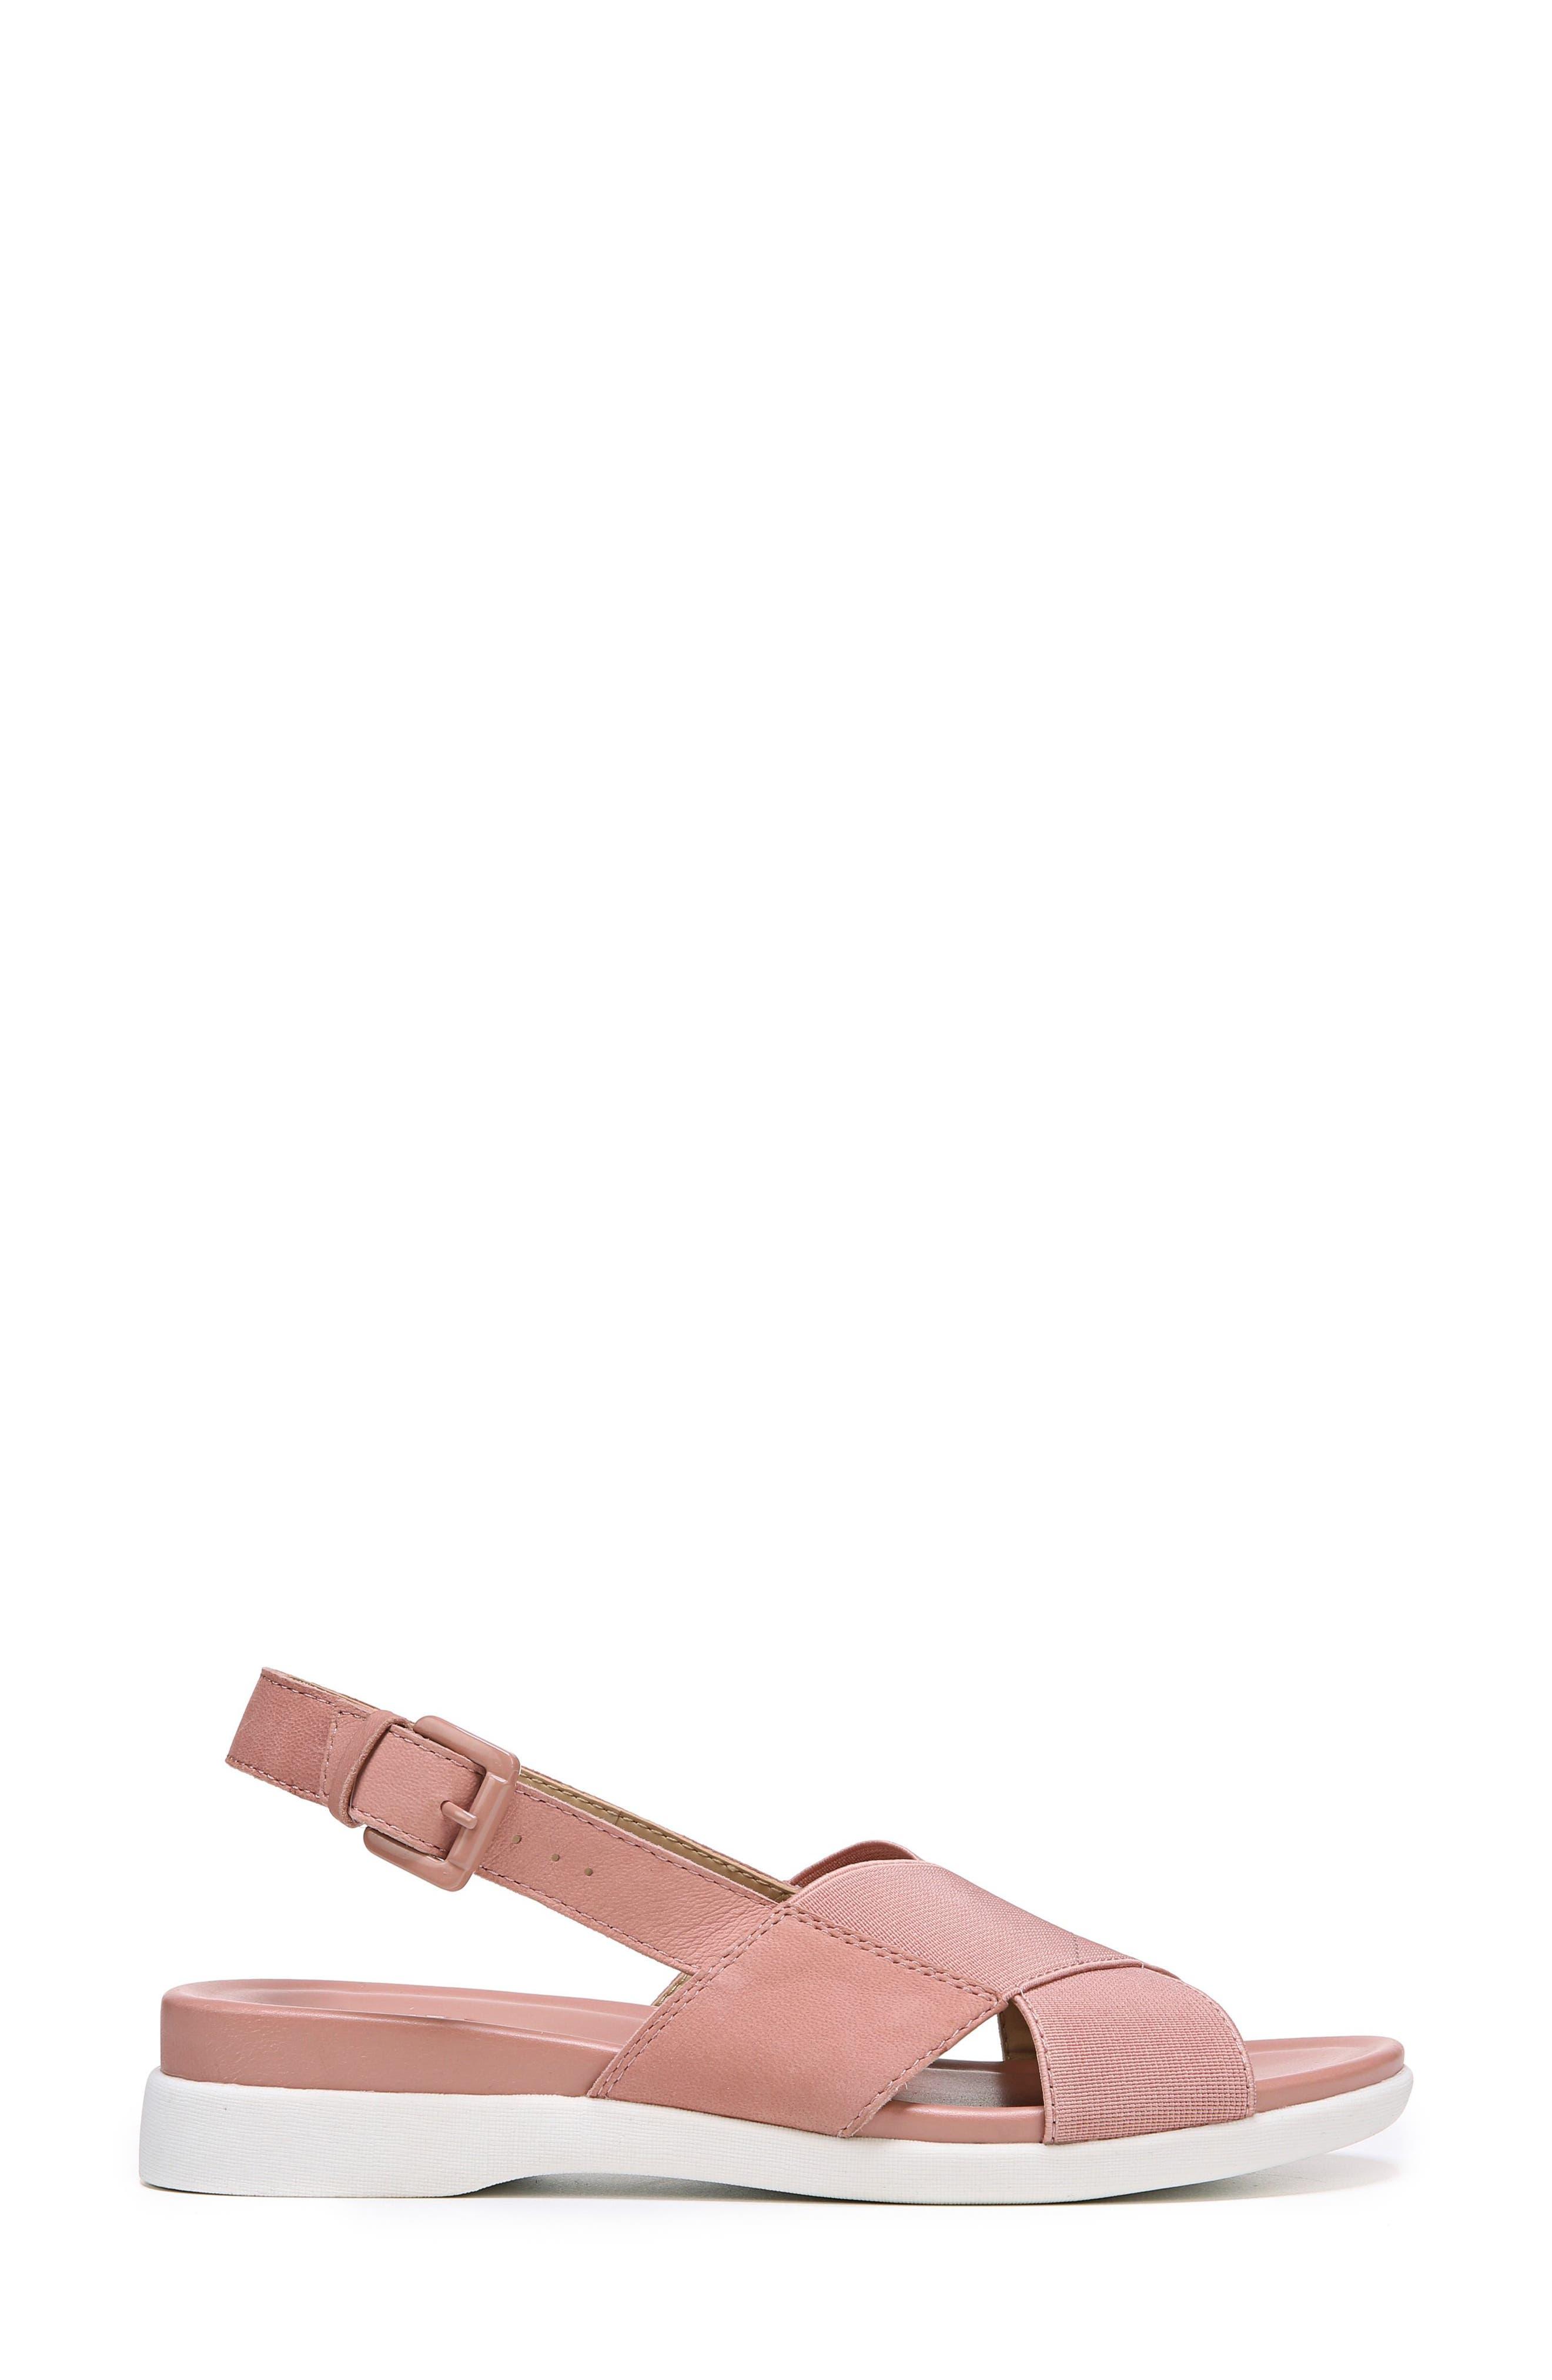 Eliza Wedge Sandal,                             Alternate thumbnail 3, color,                             Pink Nubuck Leather